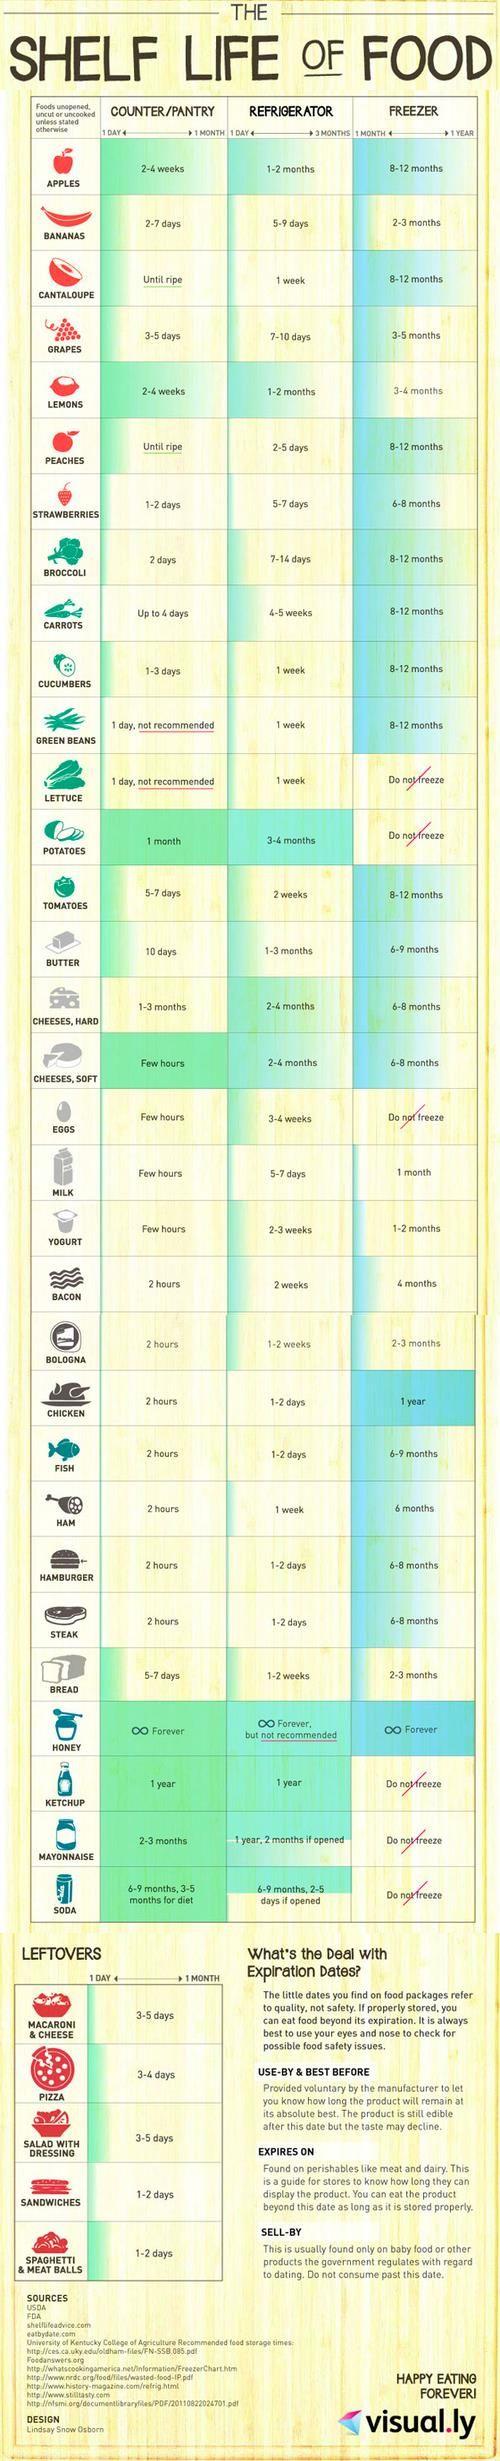 Life hack - The Shelf Life of Food